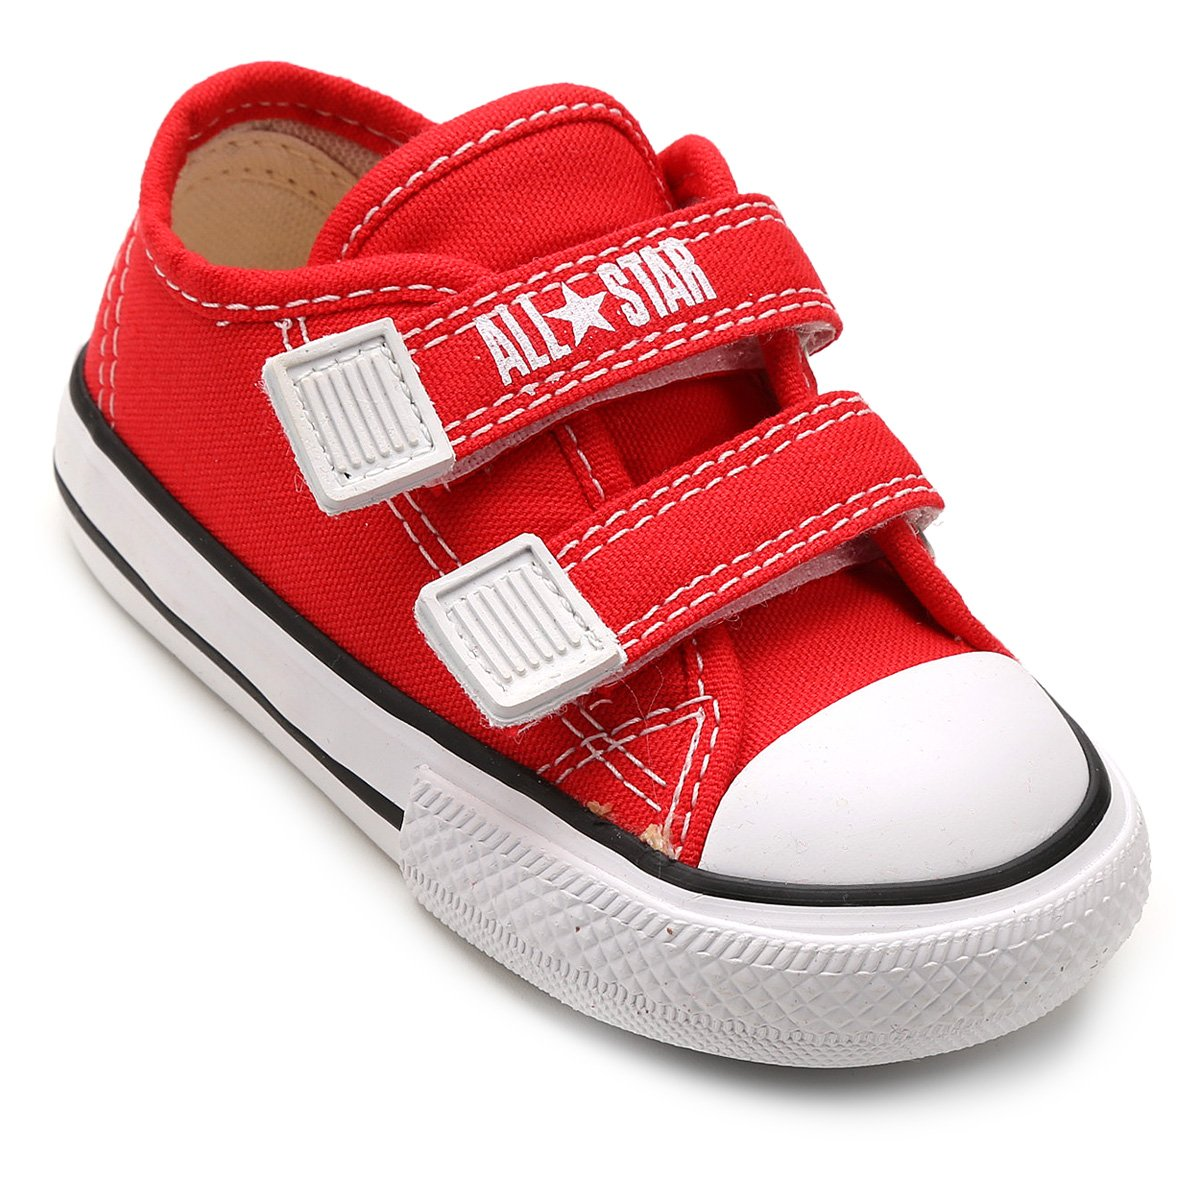 dfbdad1156b Shopping Smiles - Tênis Infantil Converse All Star CT Border 2 Velcros Baby